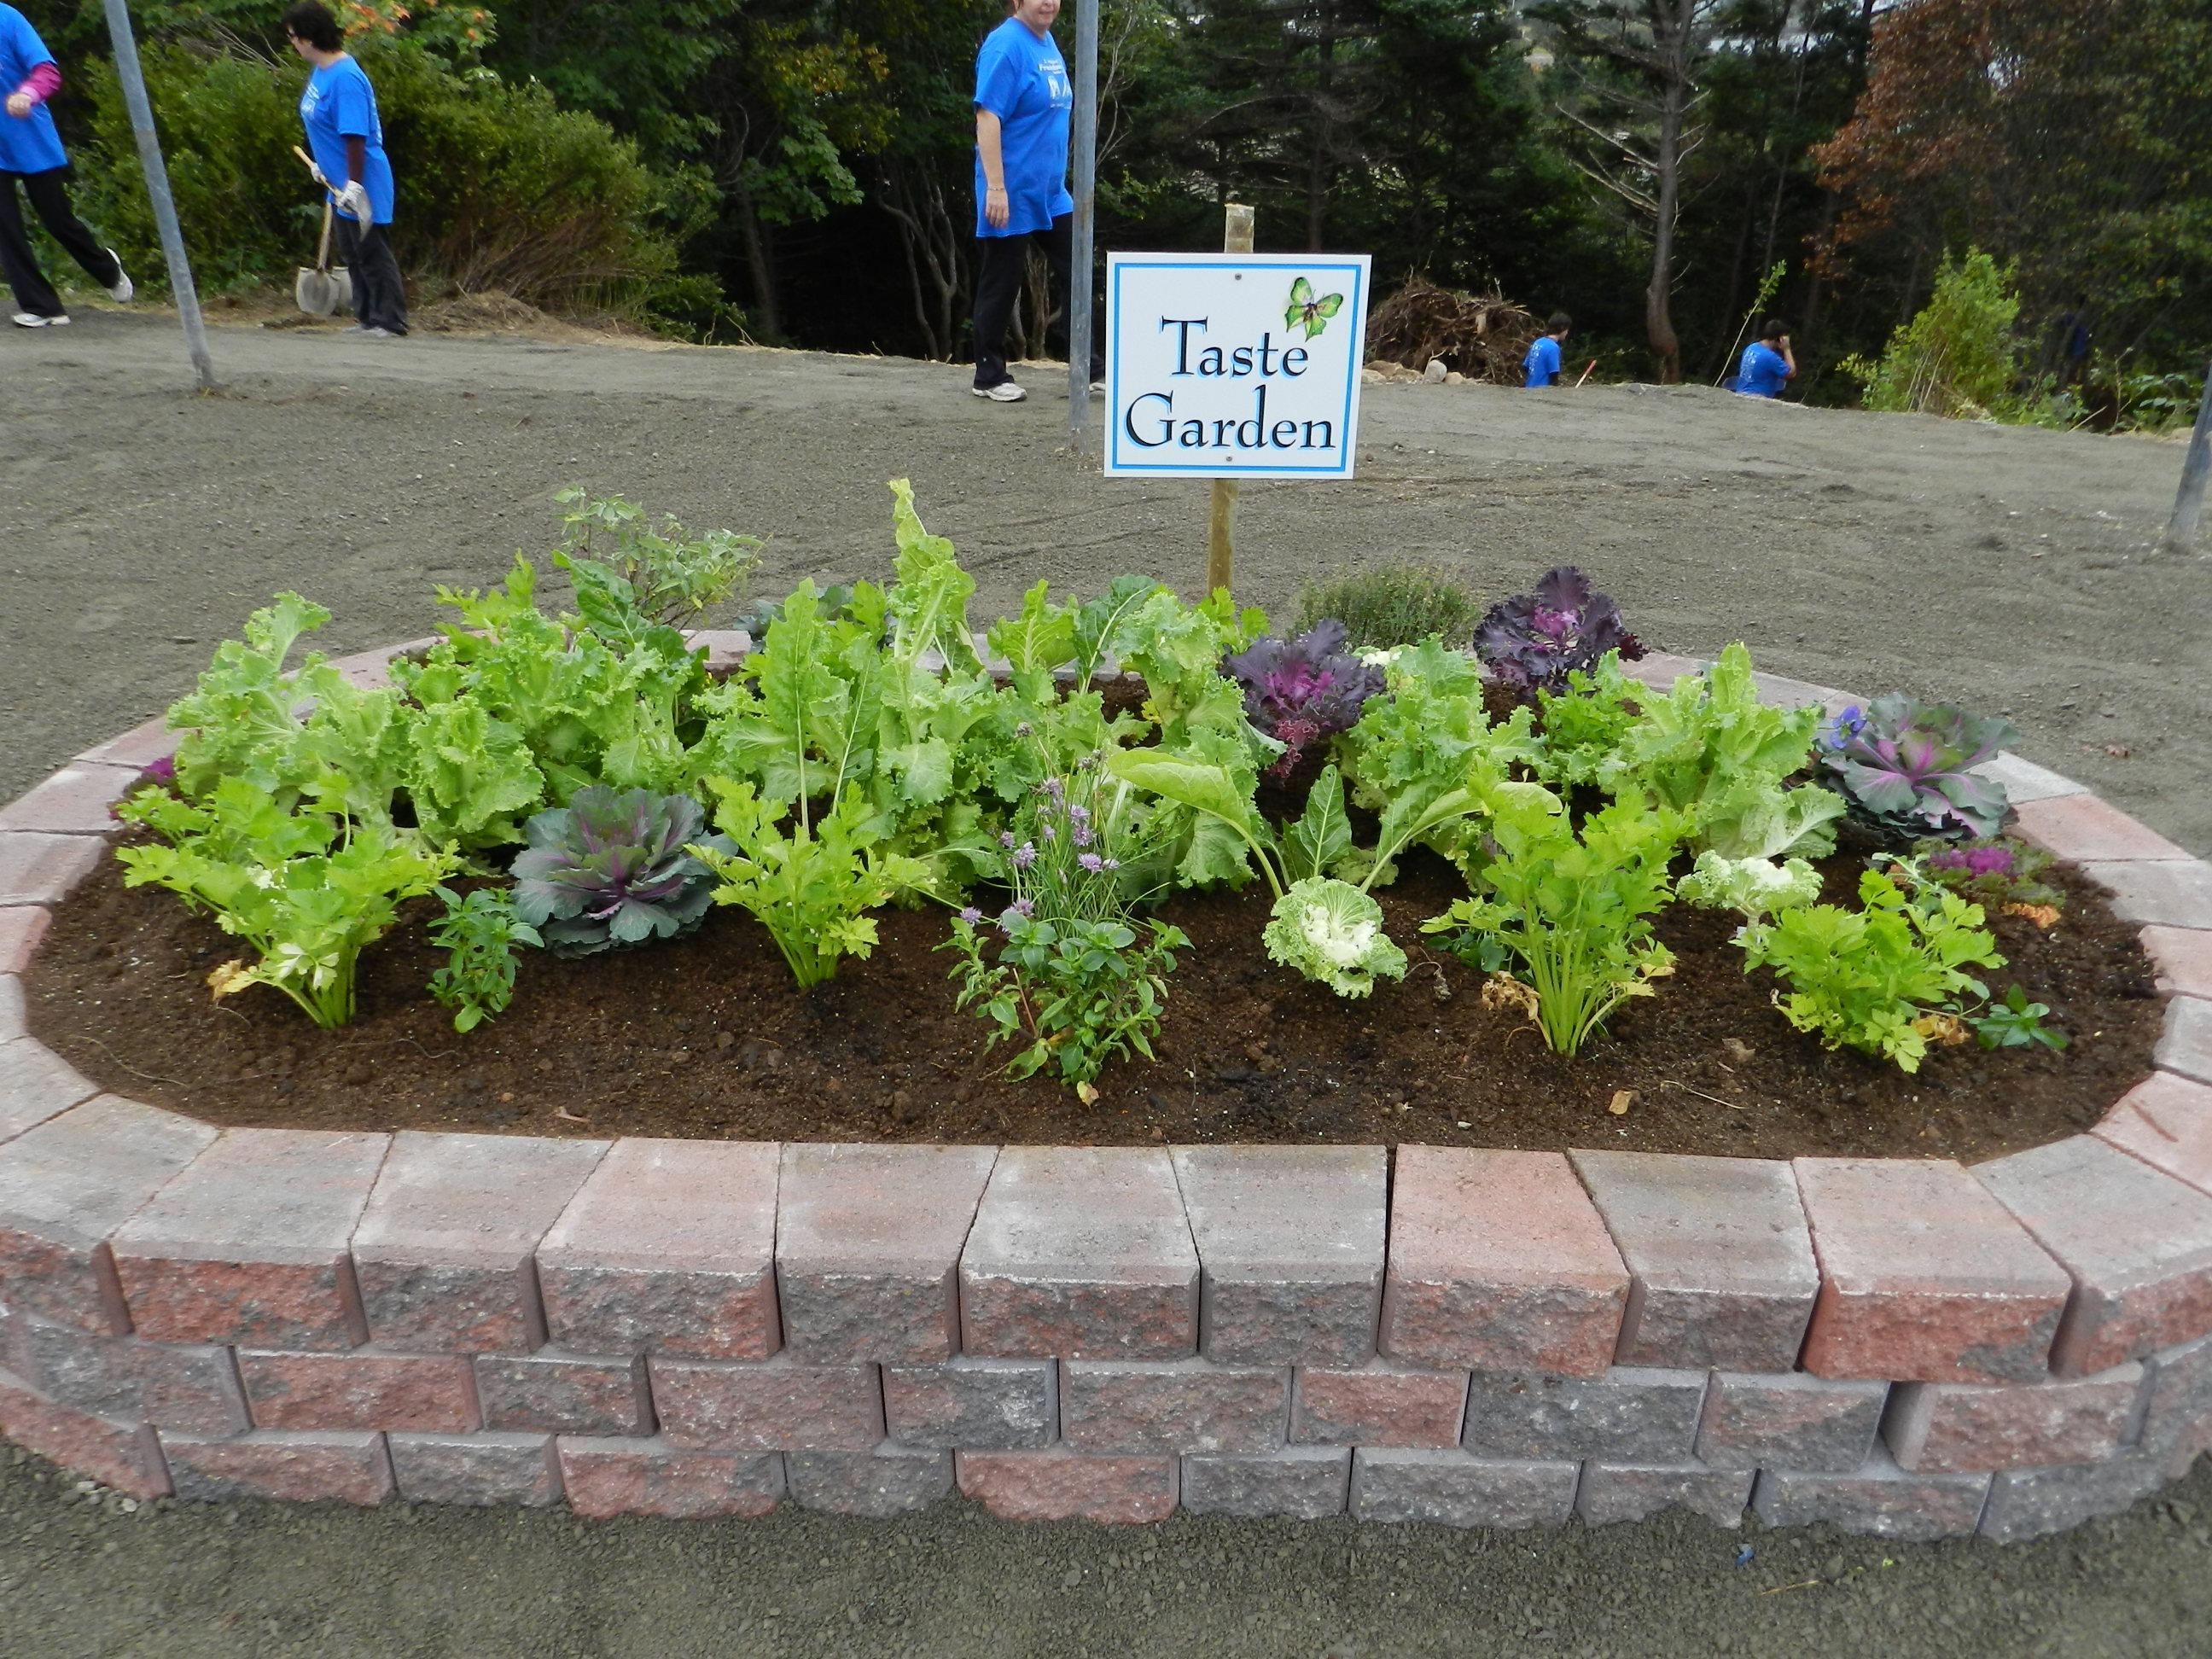 Sensory Taste Garden Sensory Garden Ideas Pinterest Gardens